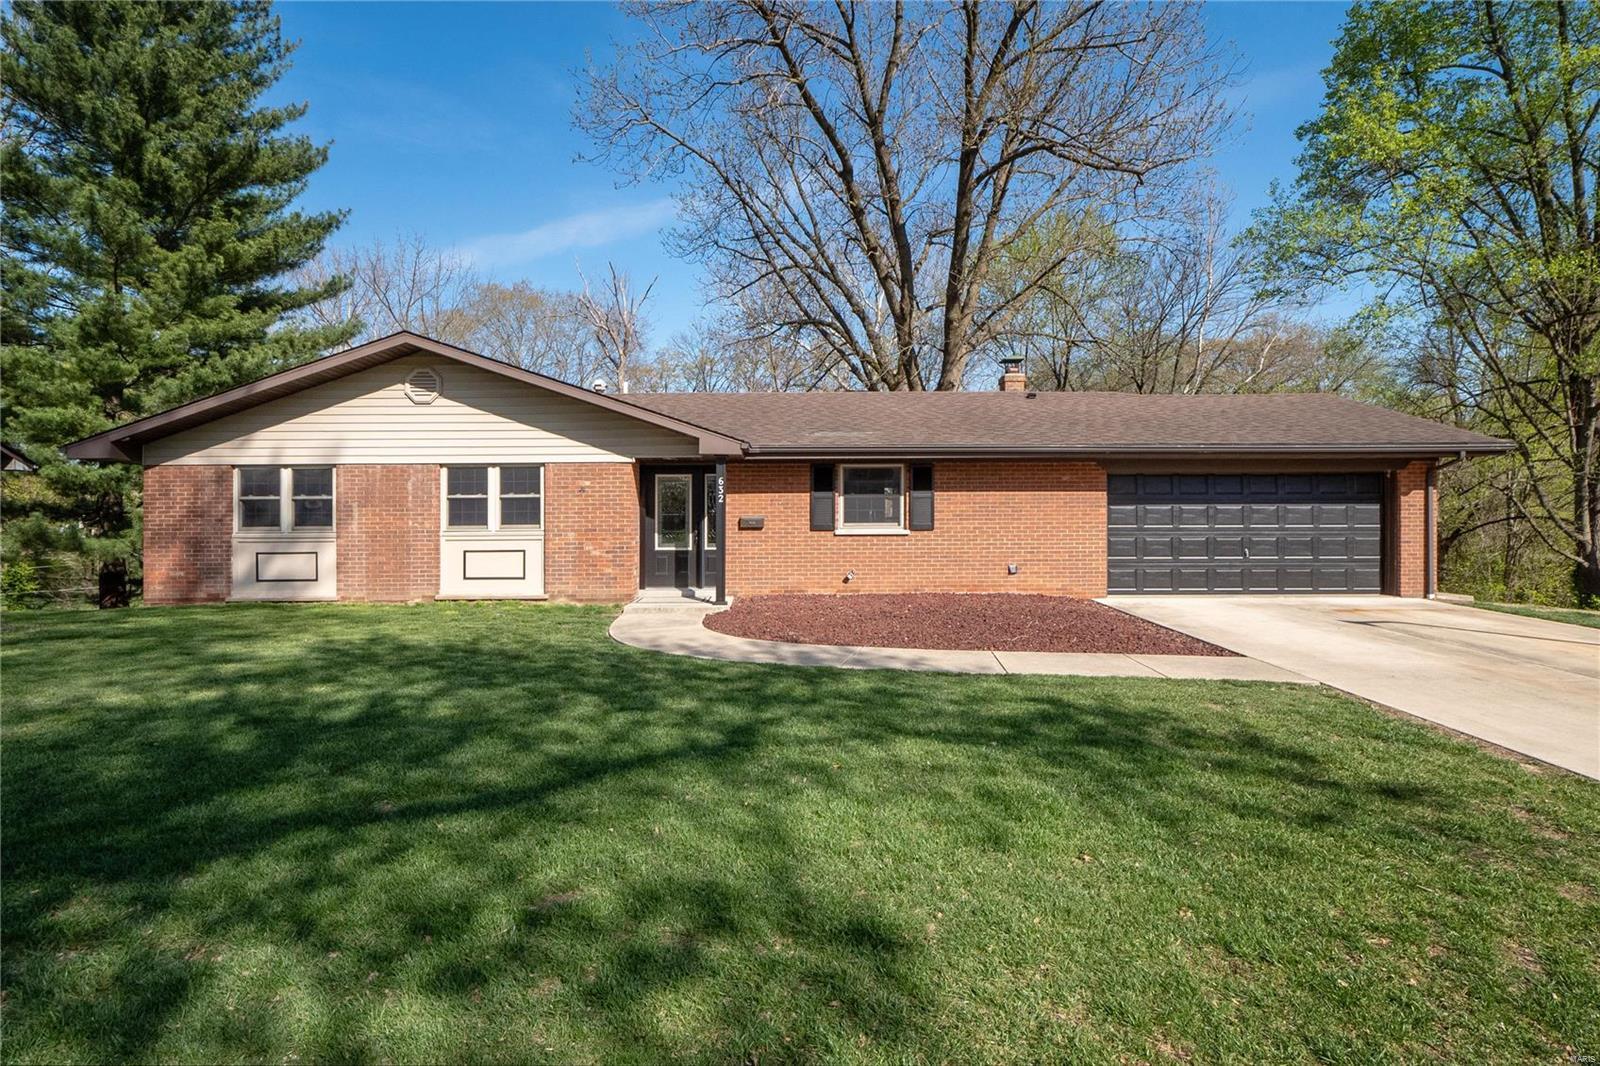 632 Springdale Drive Property Photo - Belleville, IL real estate listing